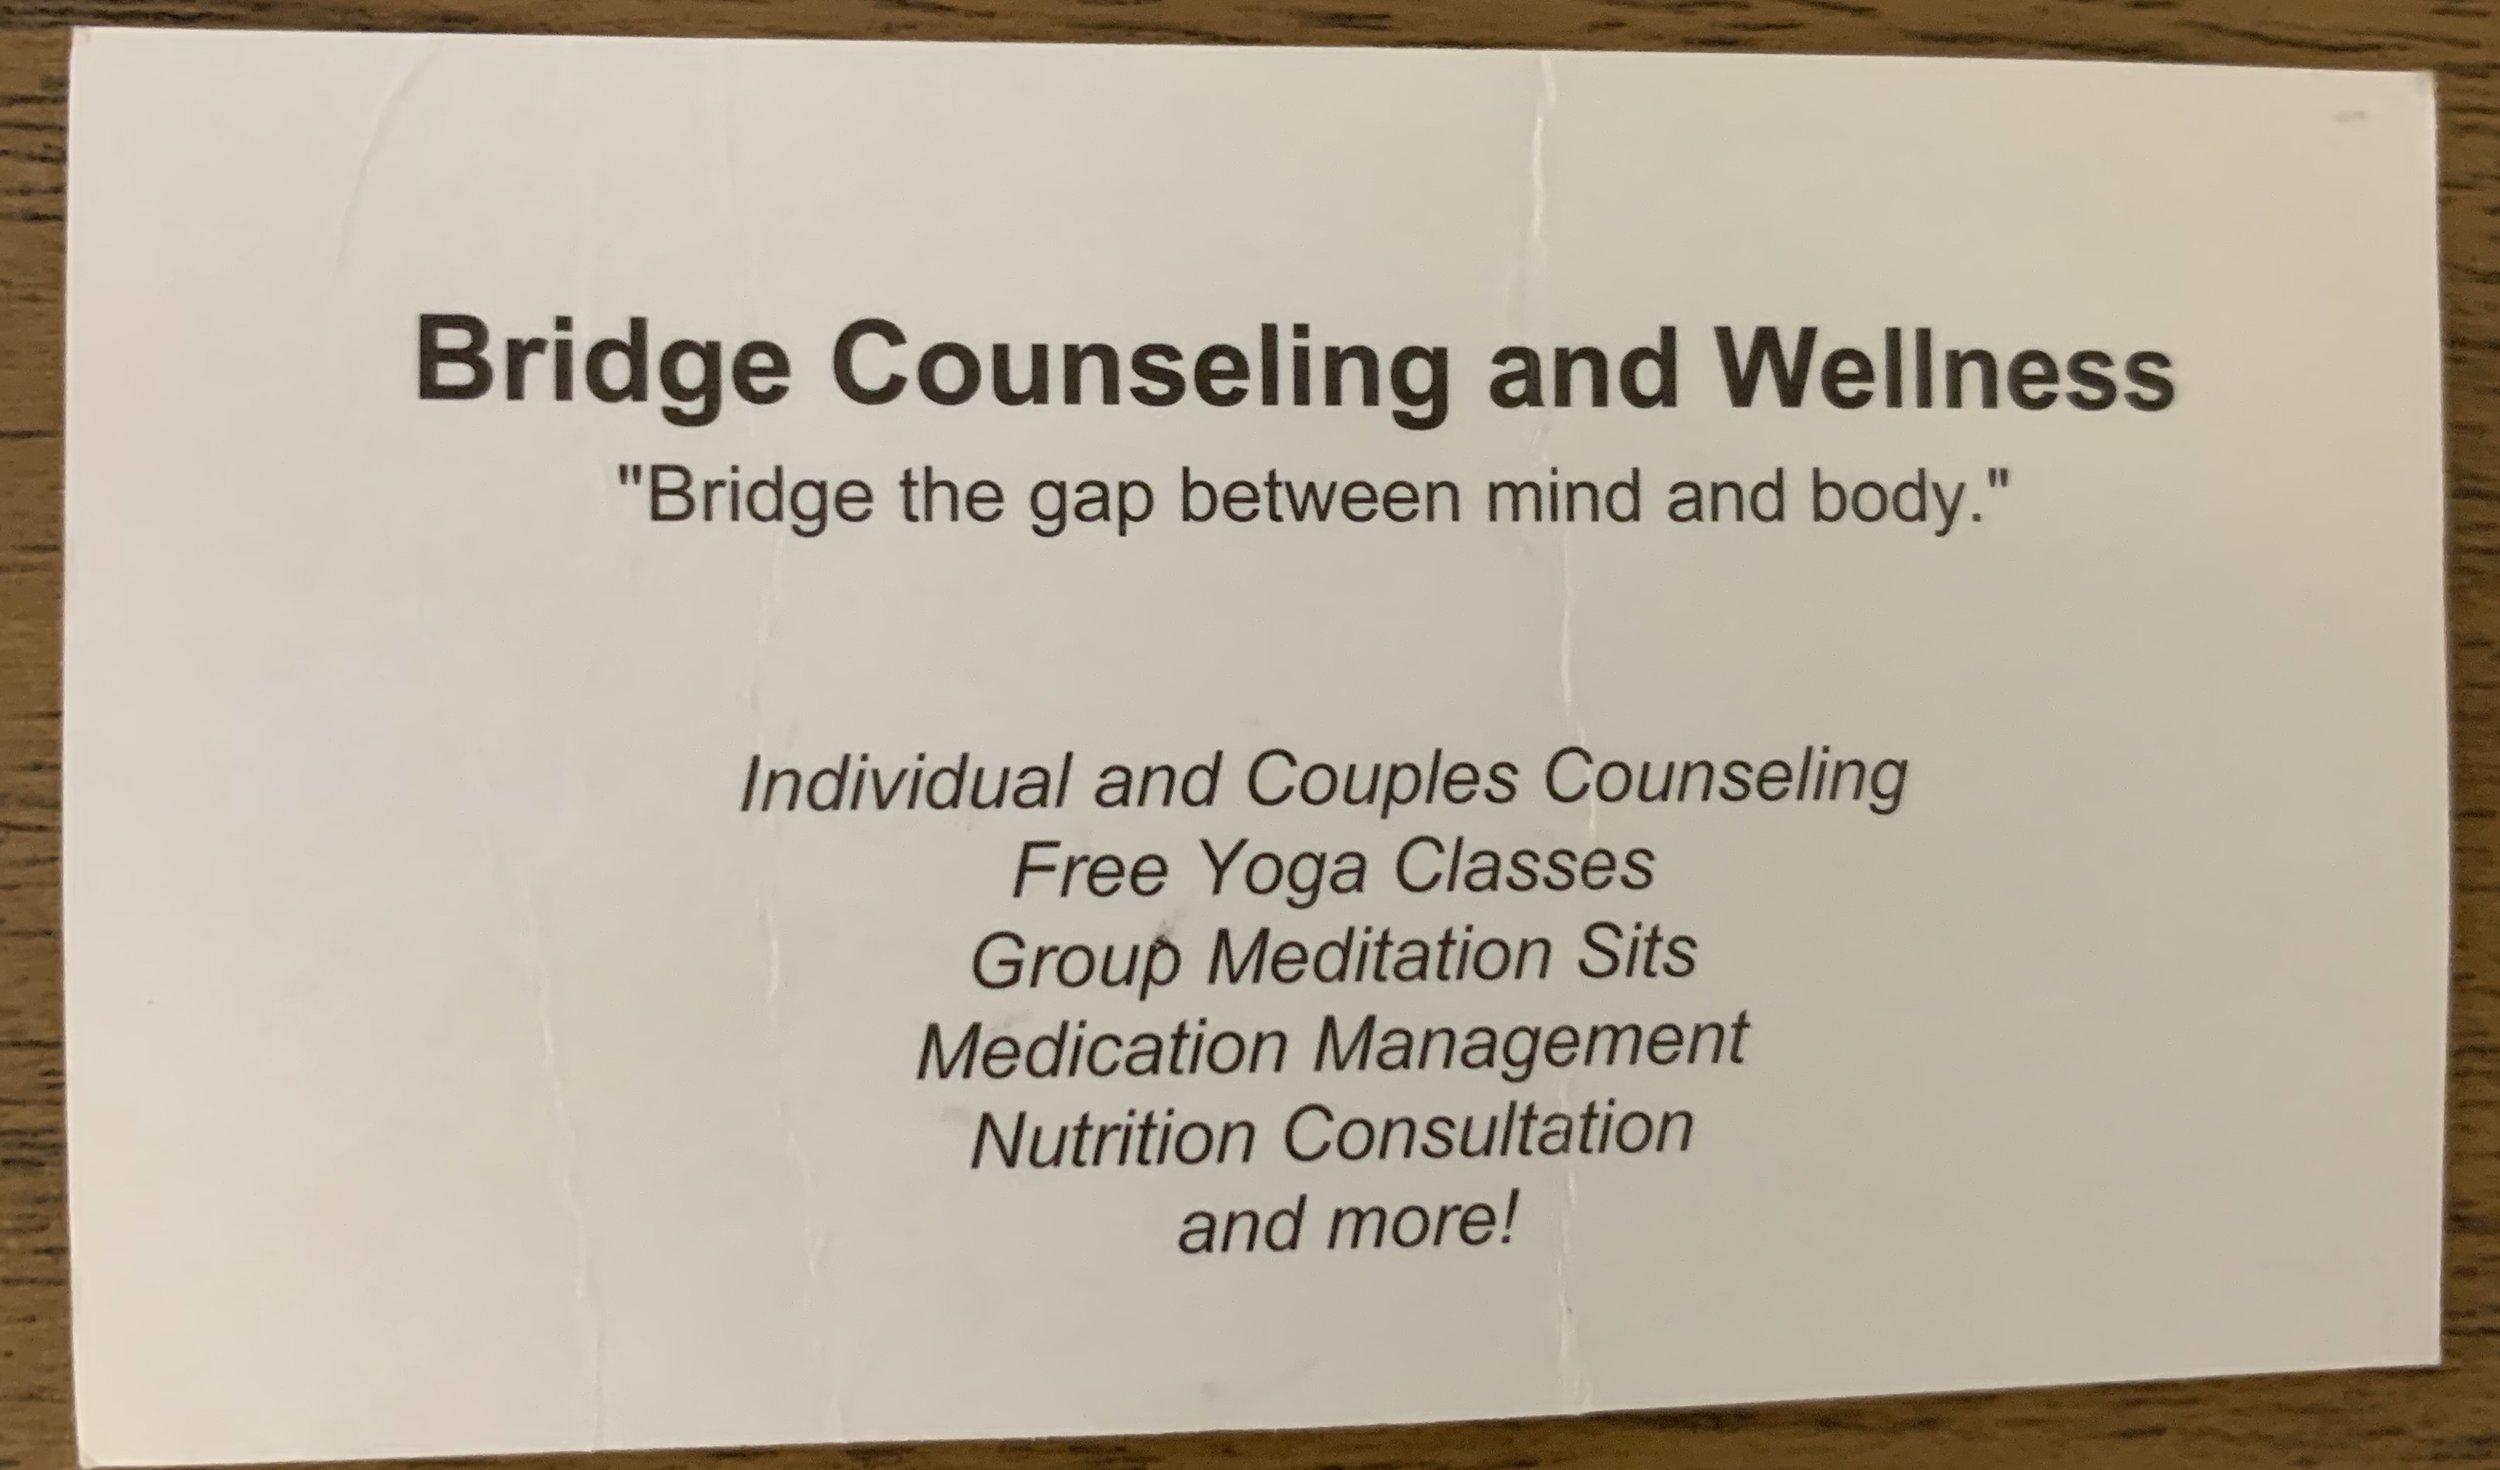 Bridge Counseling & Wellness, Bridge the gap between mind and body.